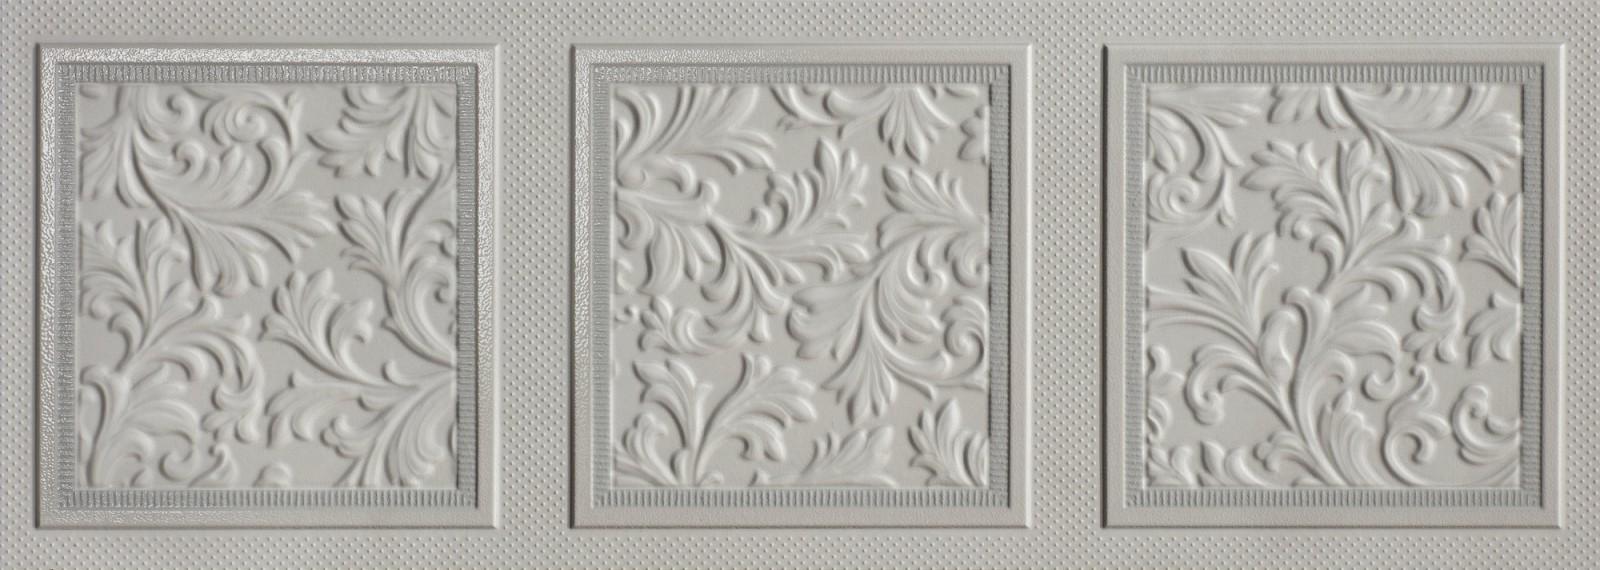 Керамическая Плитка Peronda Palette volute cold/32x90/r